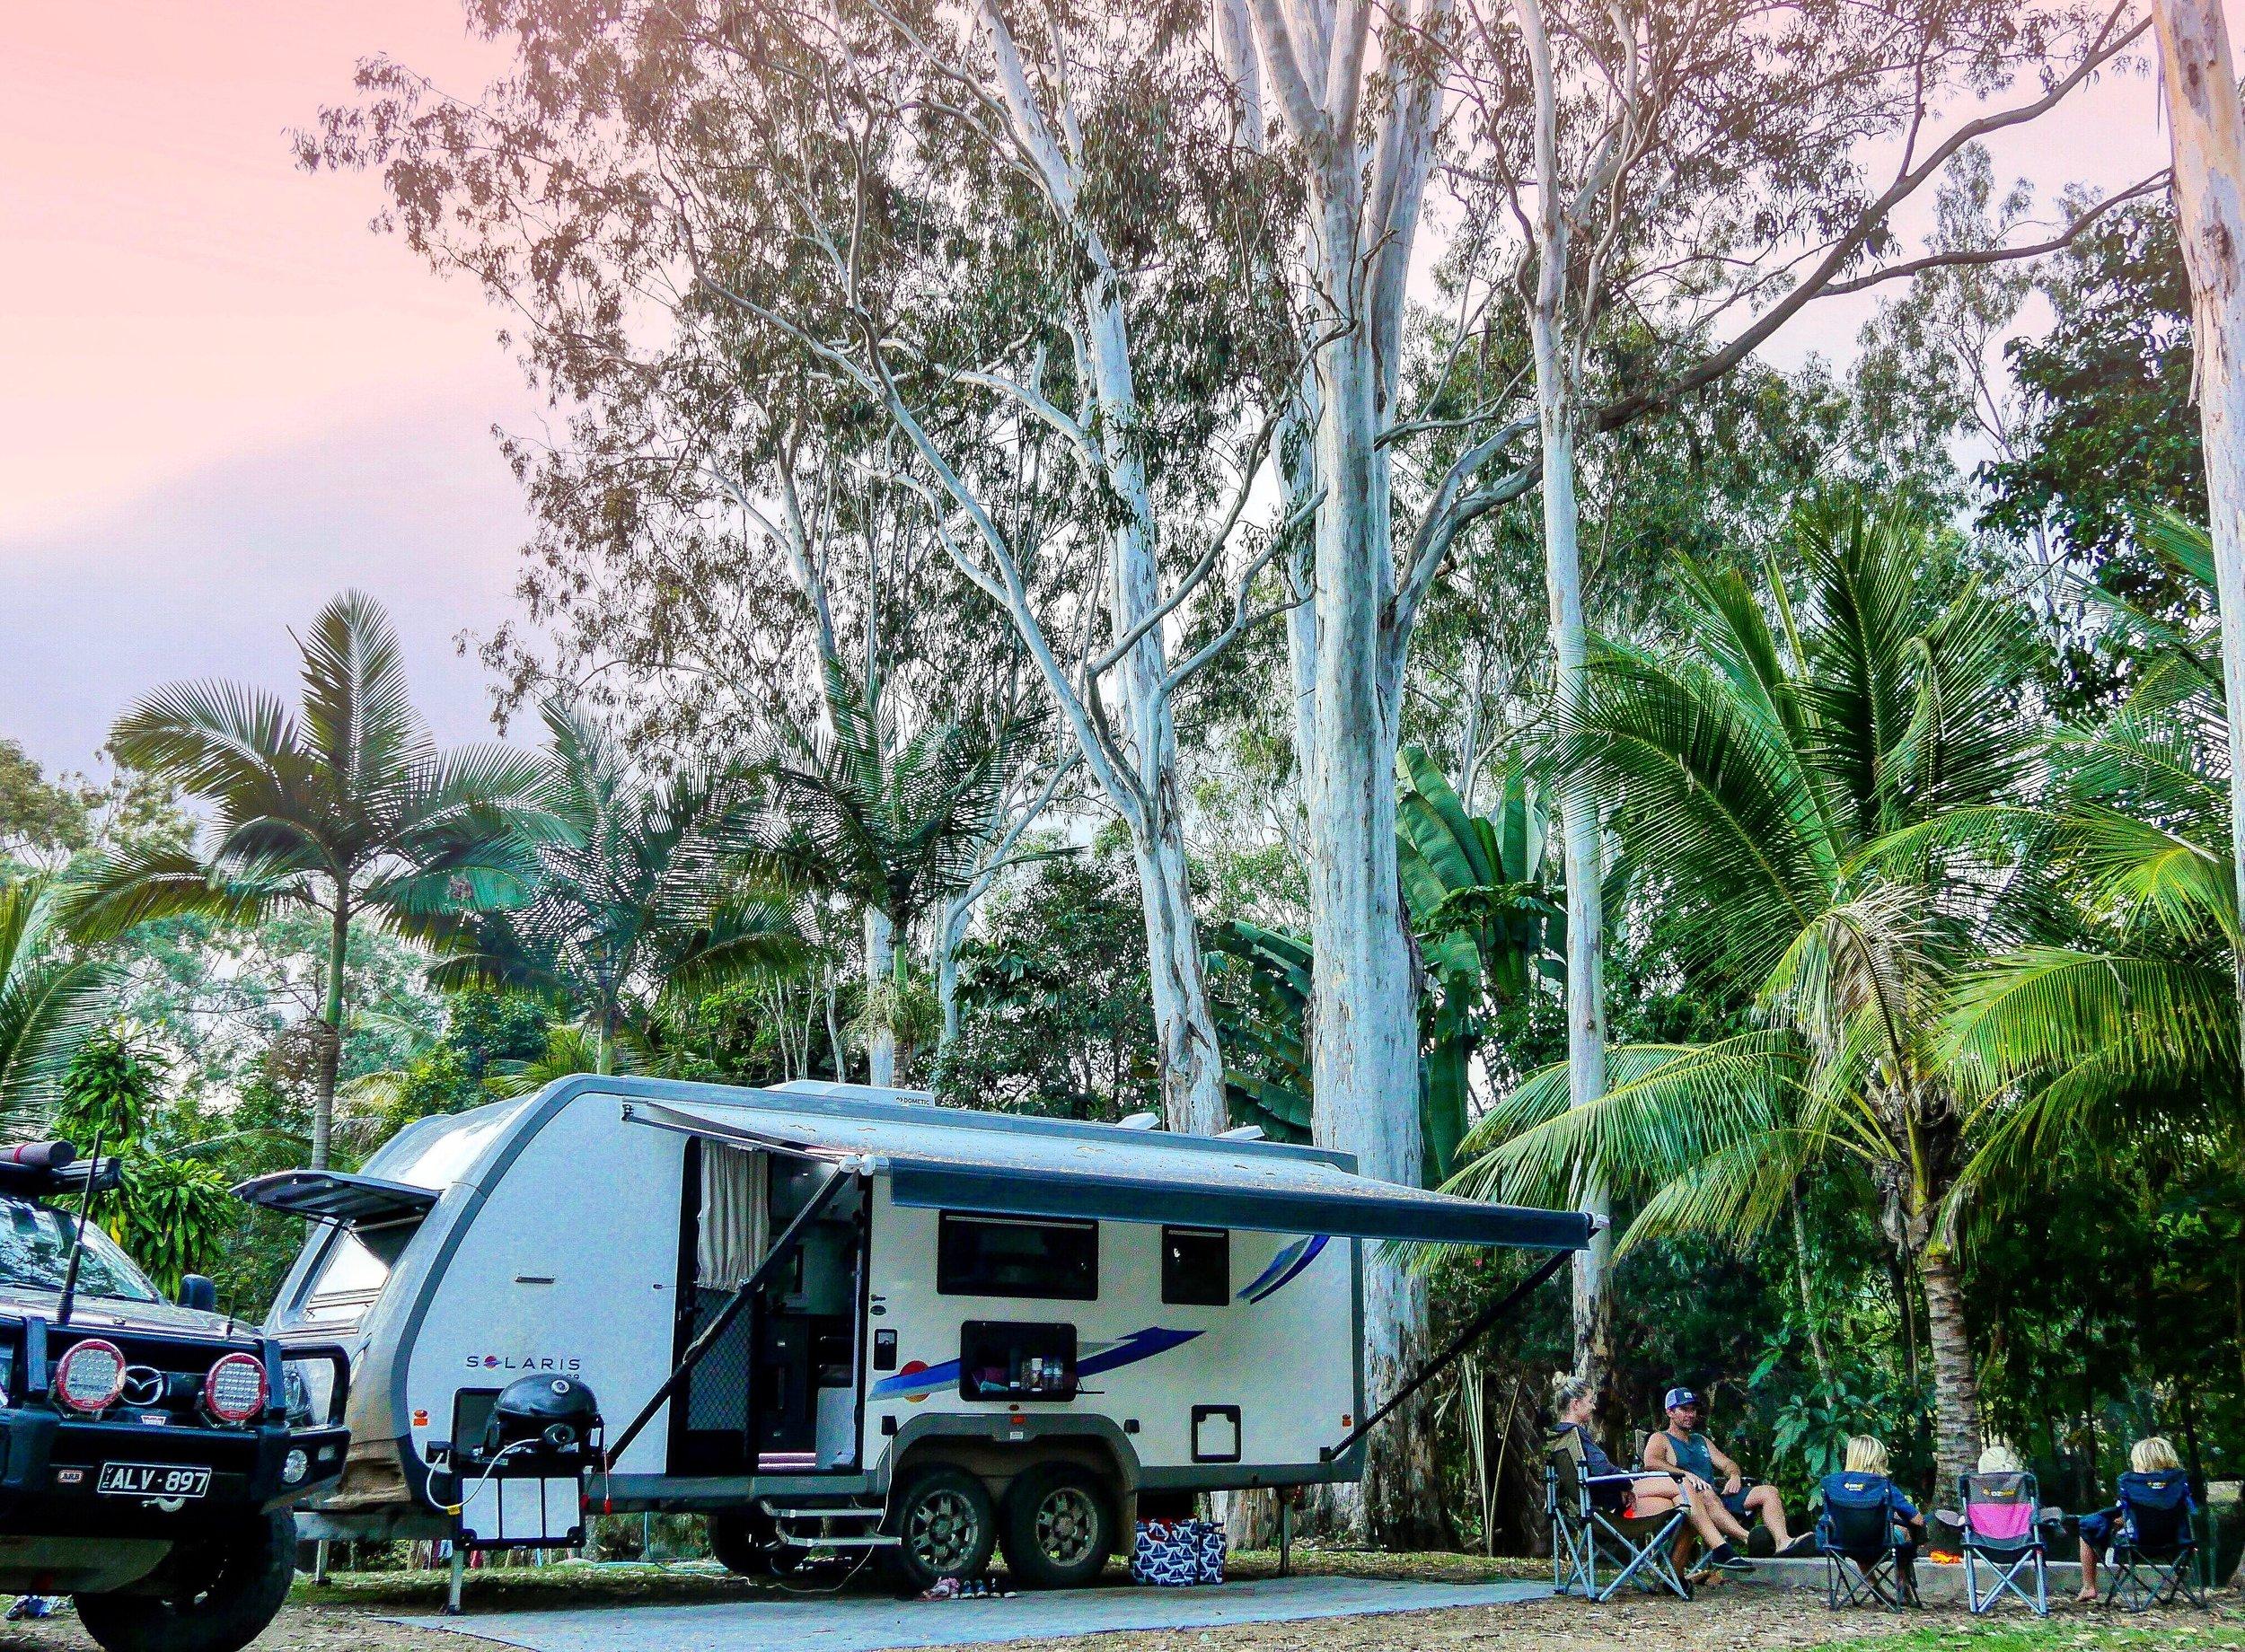 OUR BEAUTIFUL CAMPSITE AT LAKE TINAROO HOLIDAY PARK